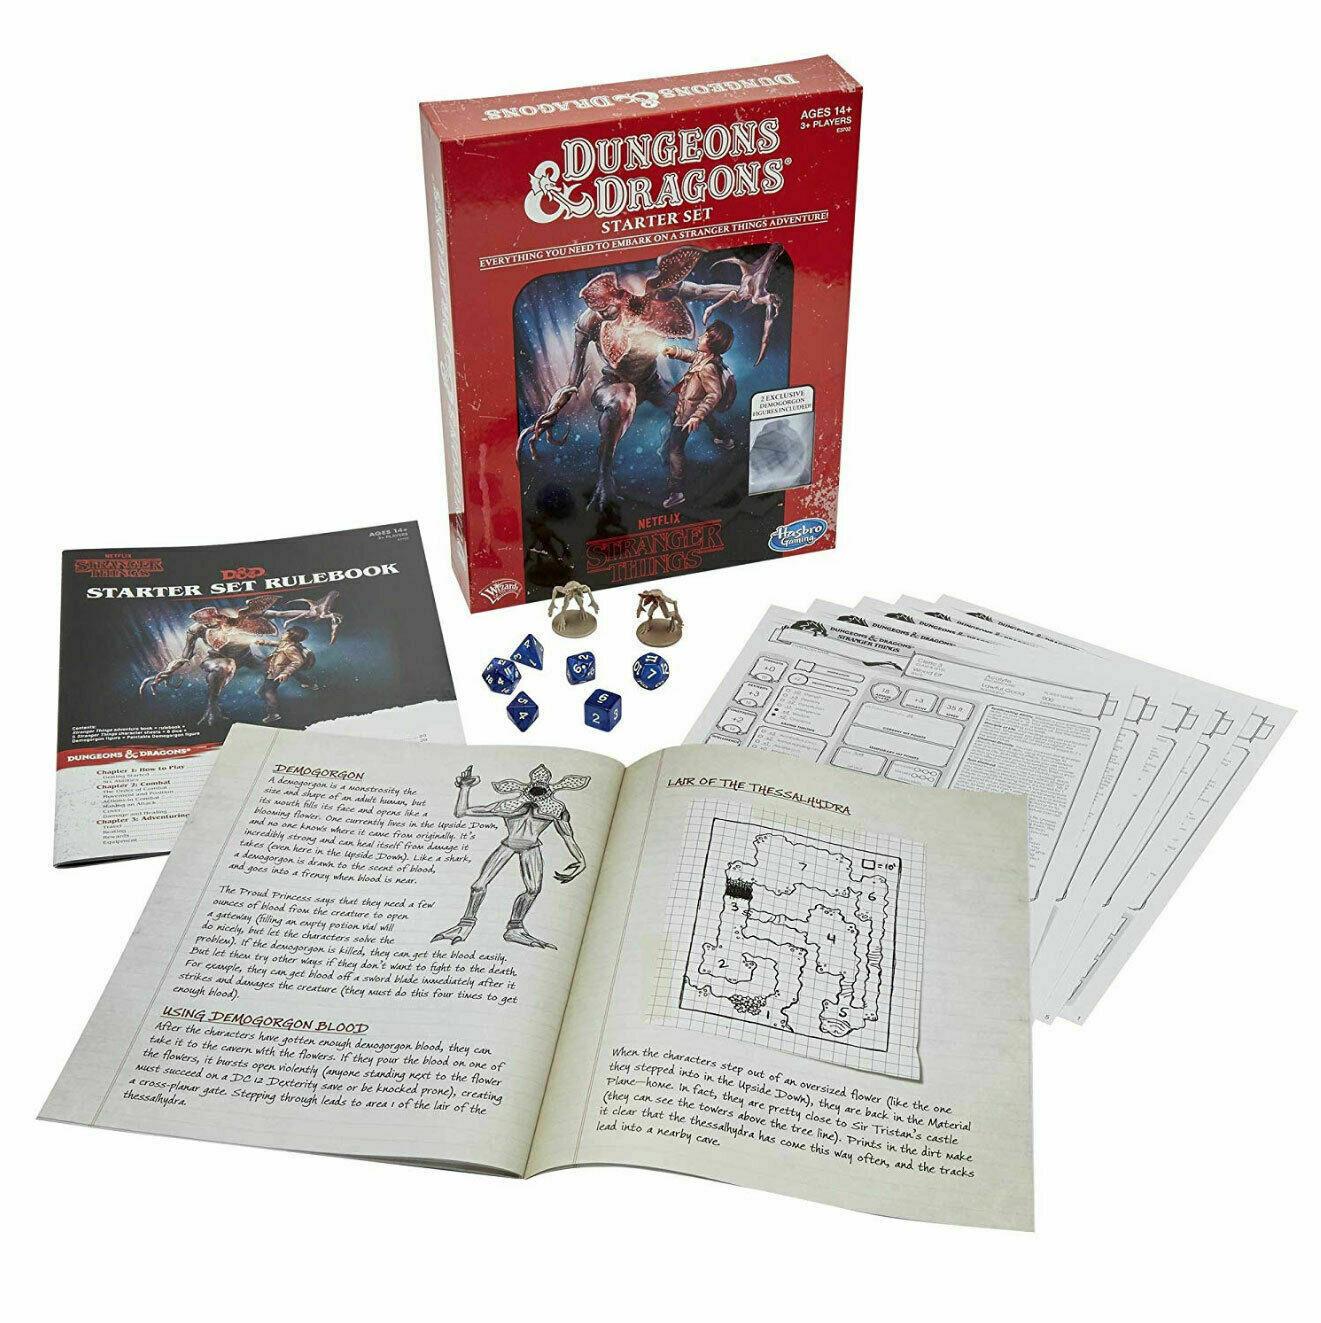 Hasbro E3702 Stranger Things Dungeons Dragons Role Playing Game Starter Set